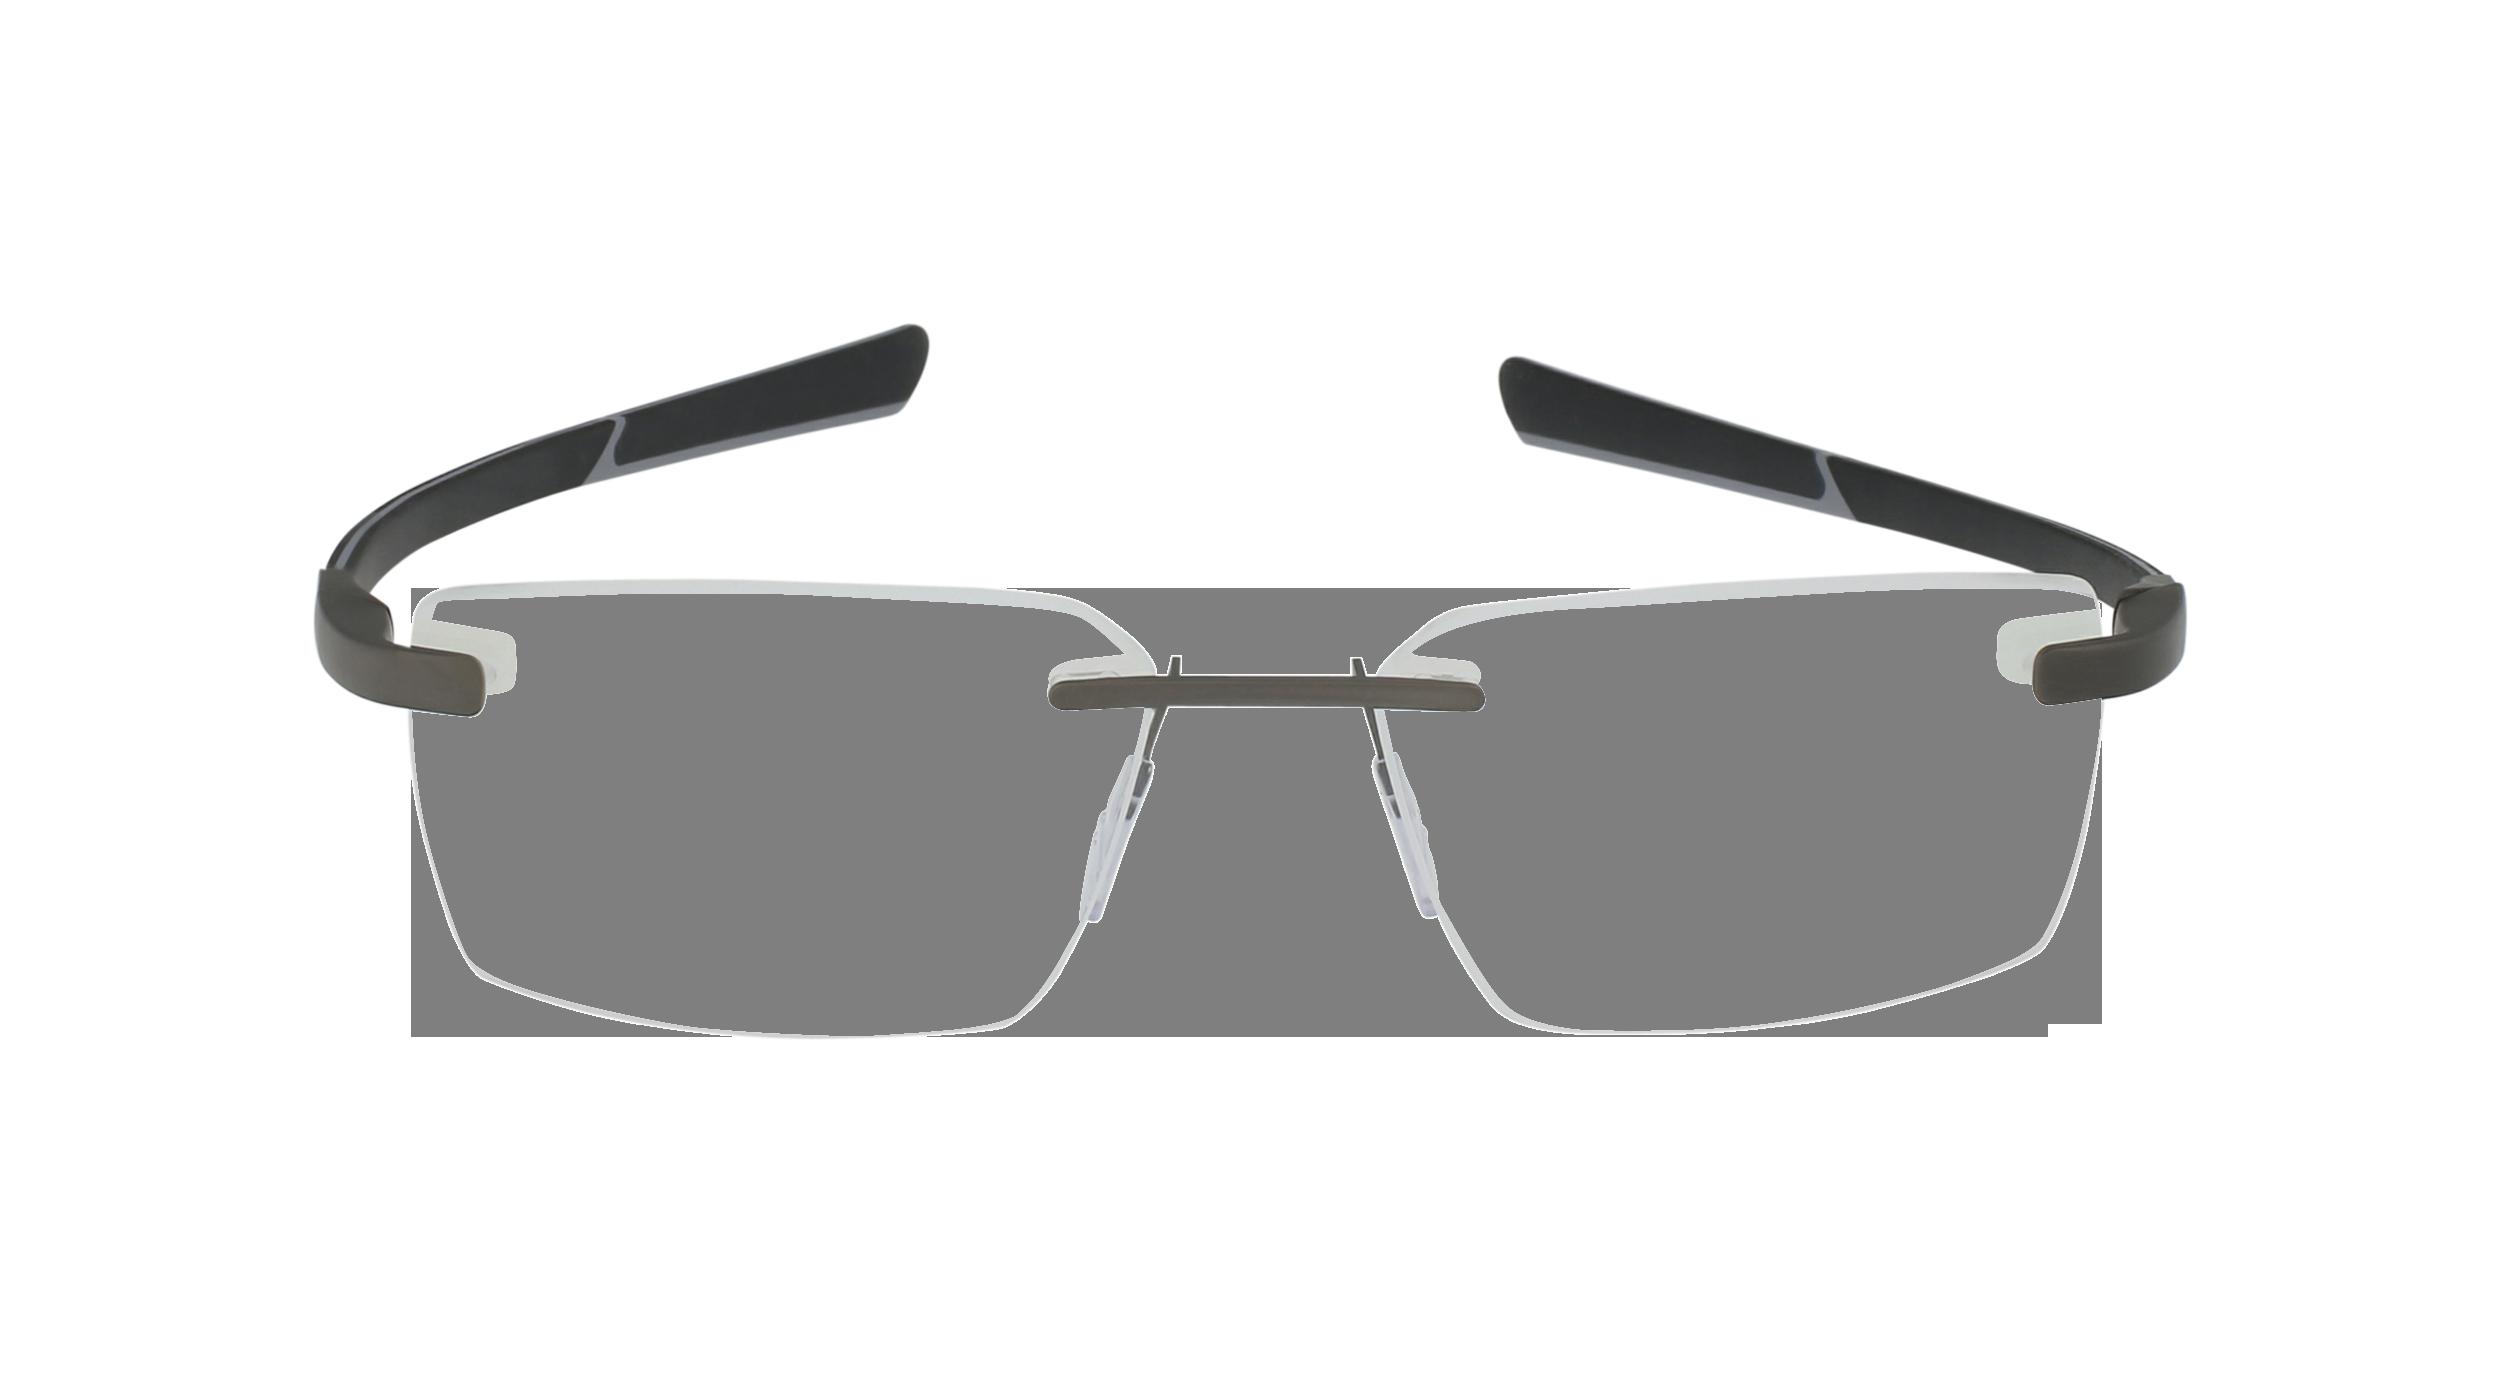 Style Name: MLSUPO25.C05.54